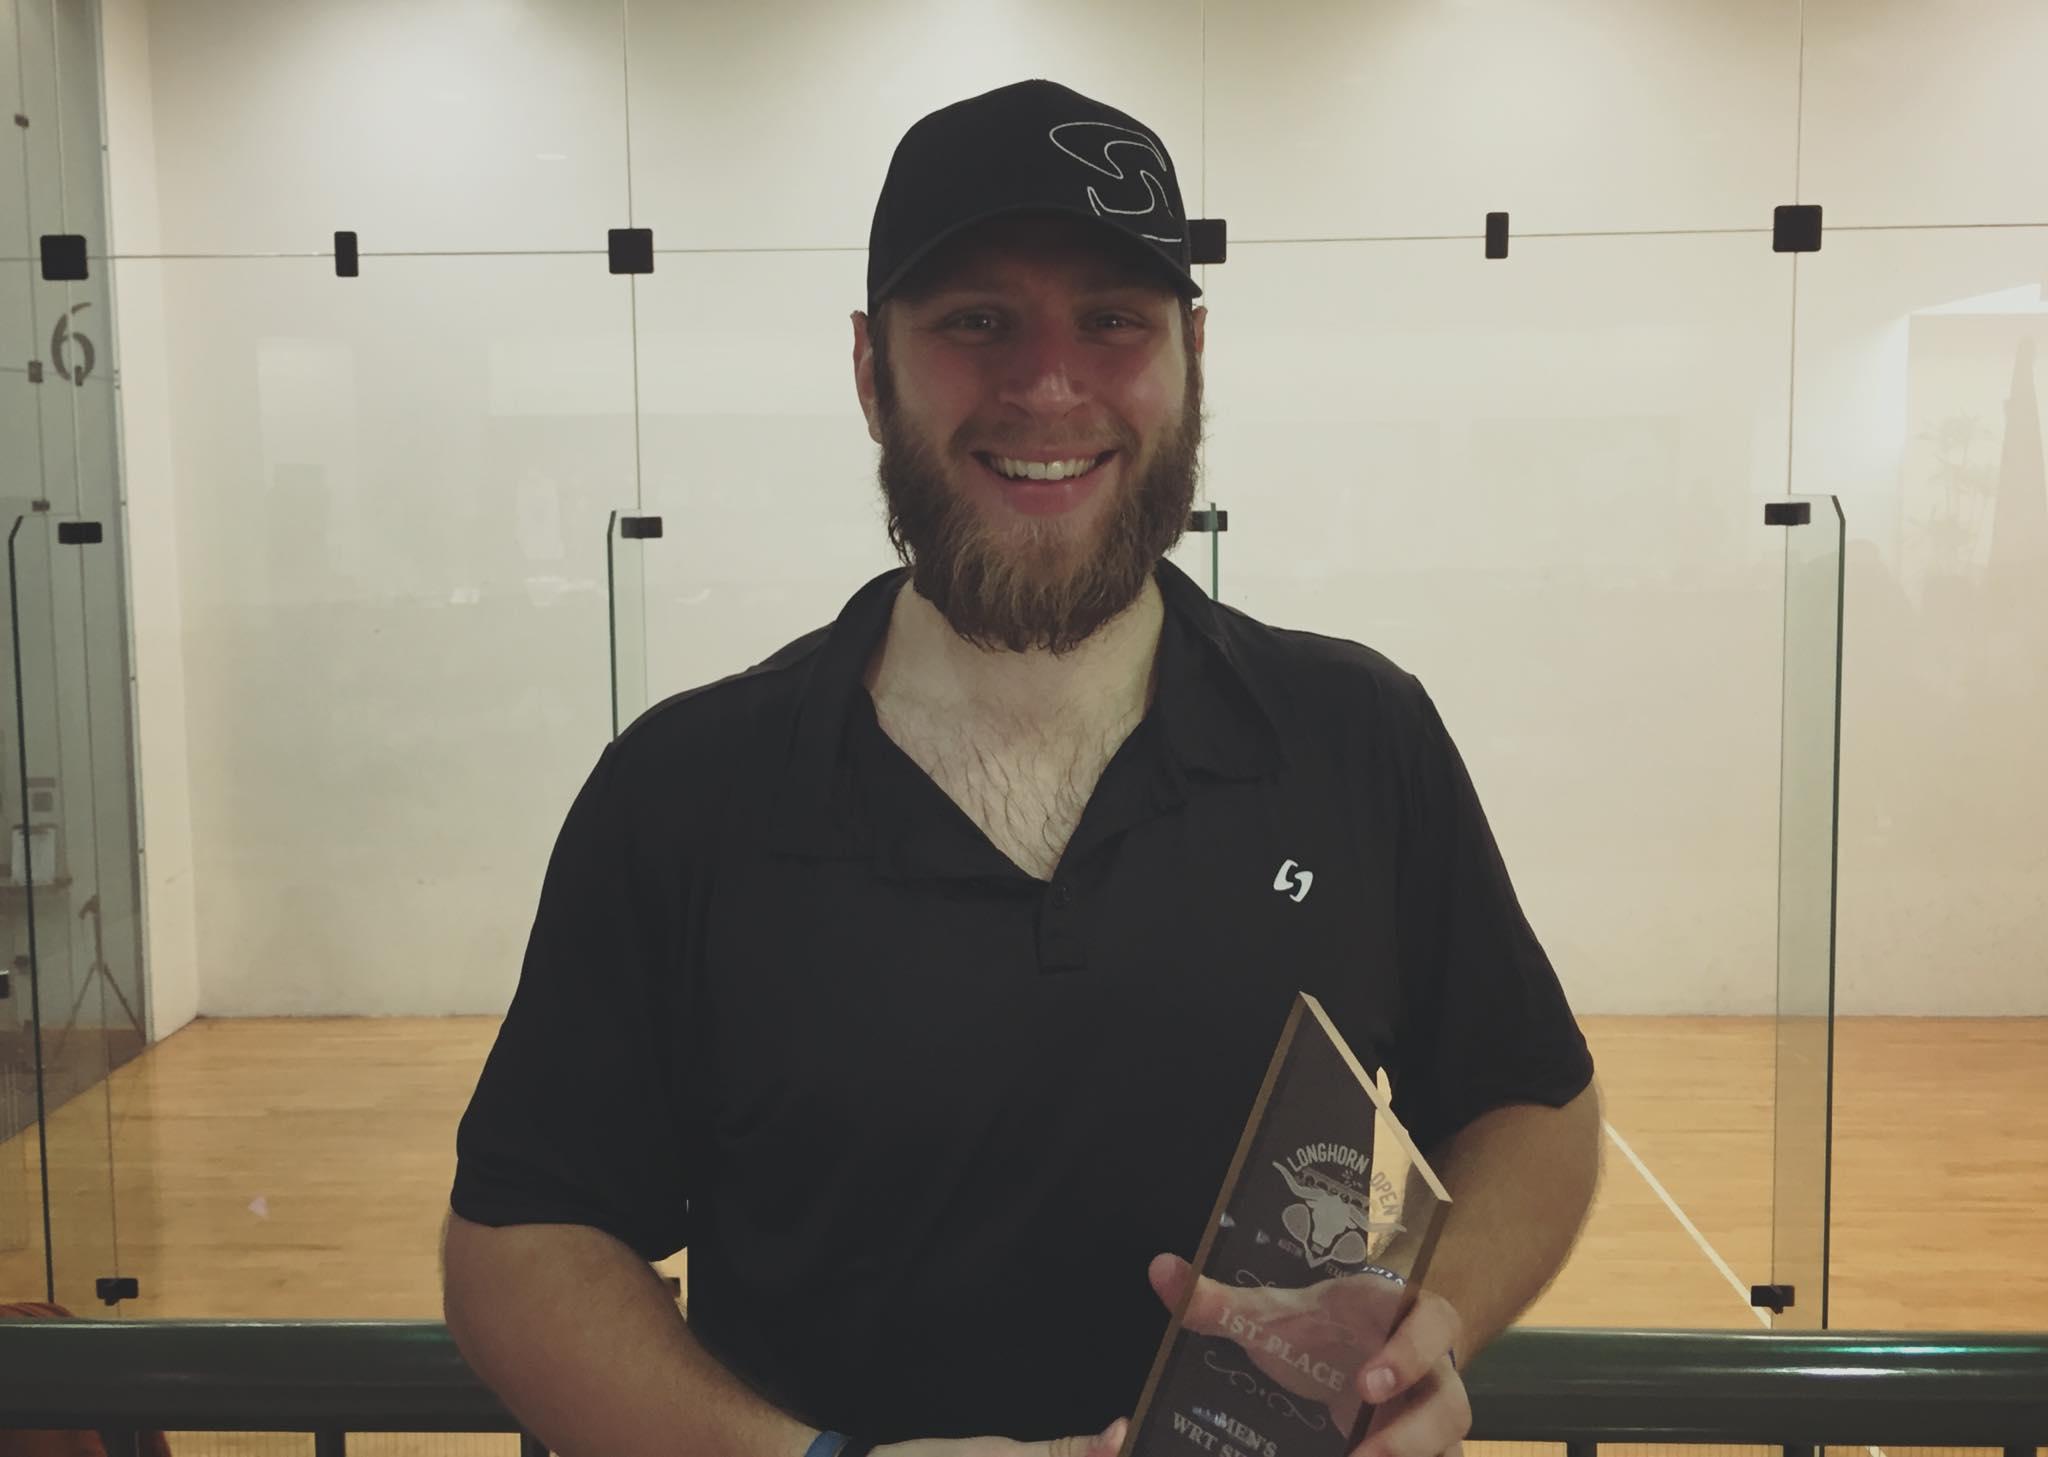 2018 Longhorn Open Singles Champion Jake Bredenbeck